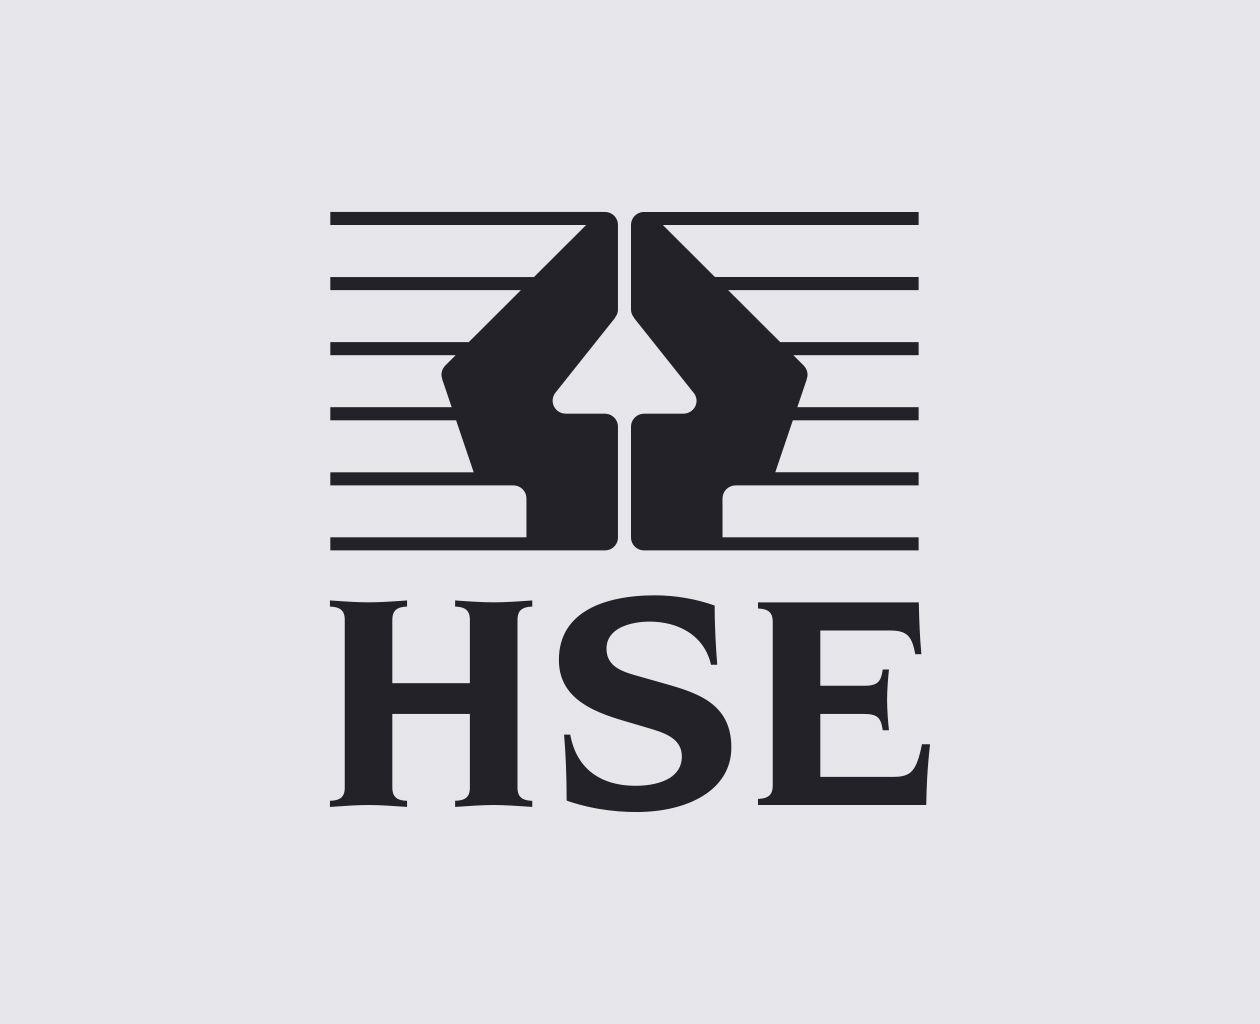 HSE, Health & Safety Executive